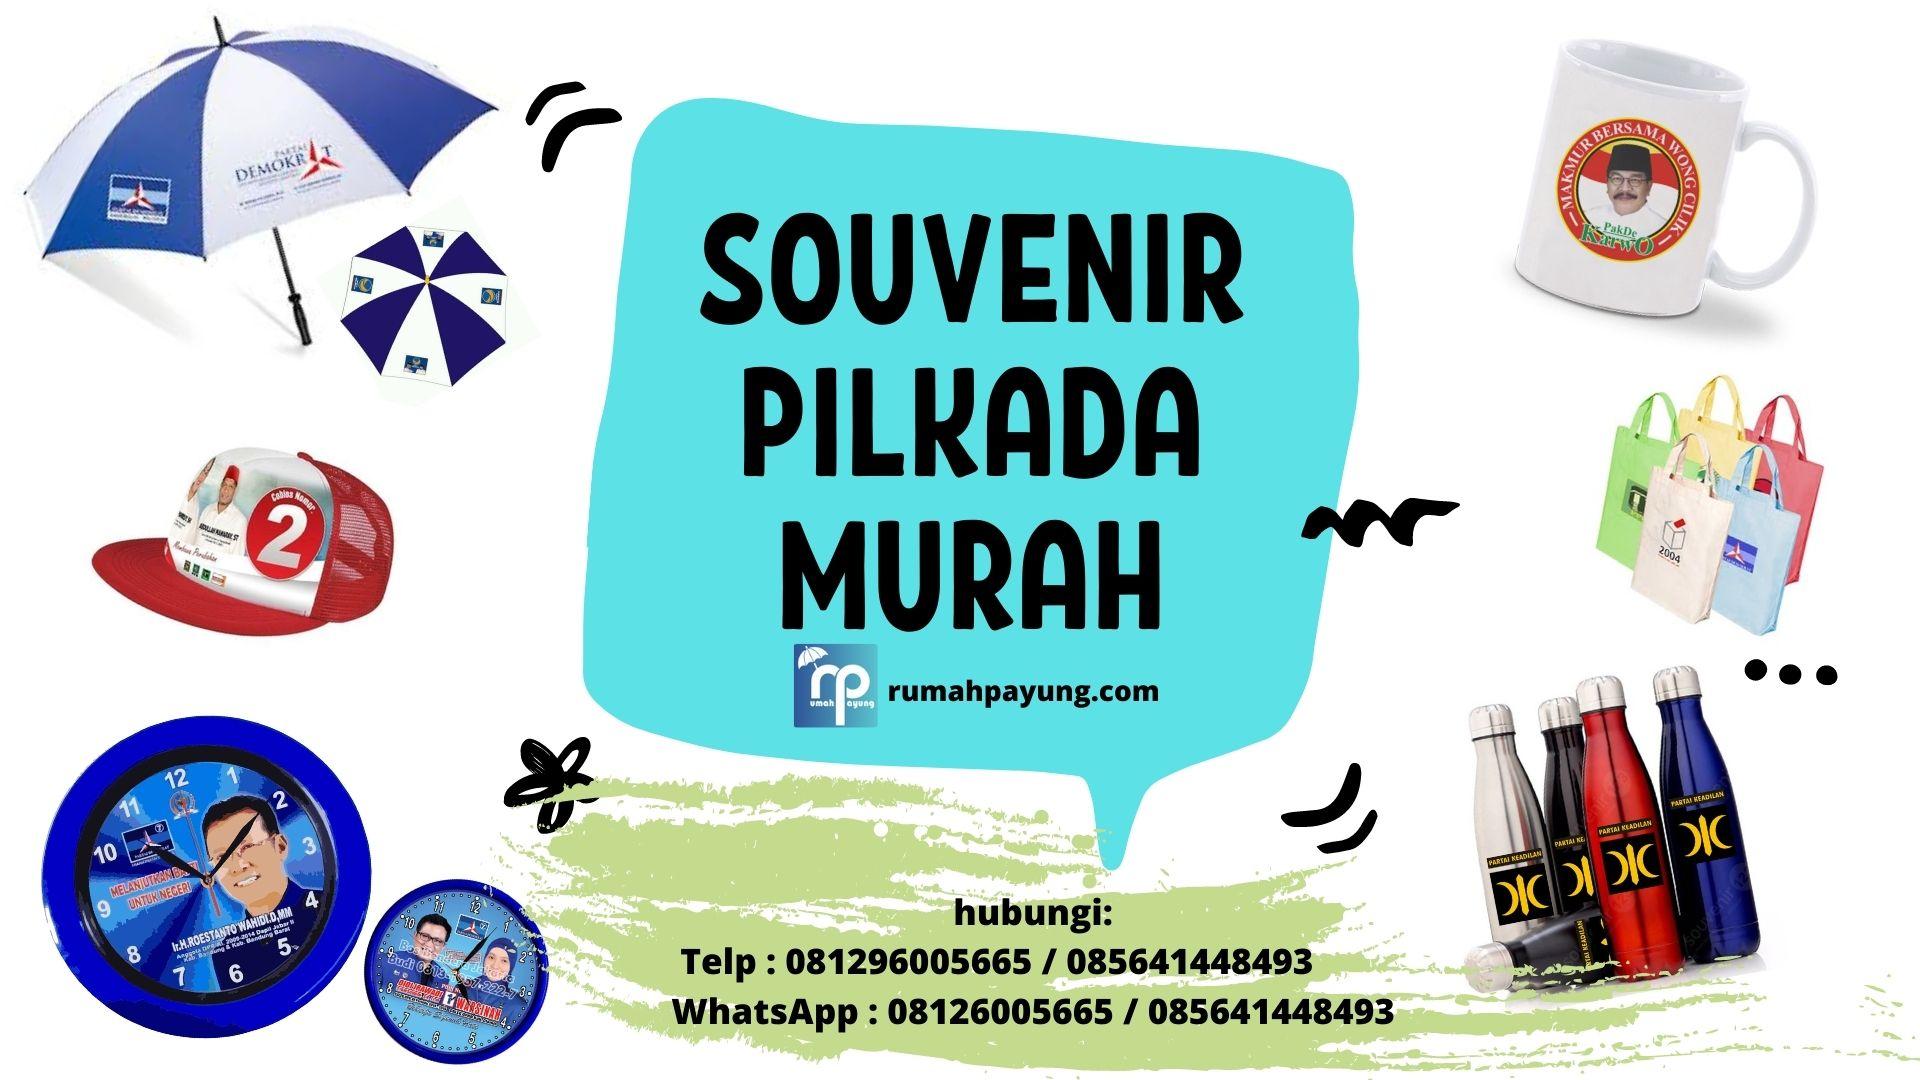 [JUAL] [GROSIR] Souvenir Pilkada Murah, Souvenir Kampanye Caleg termurah di Kota Malang